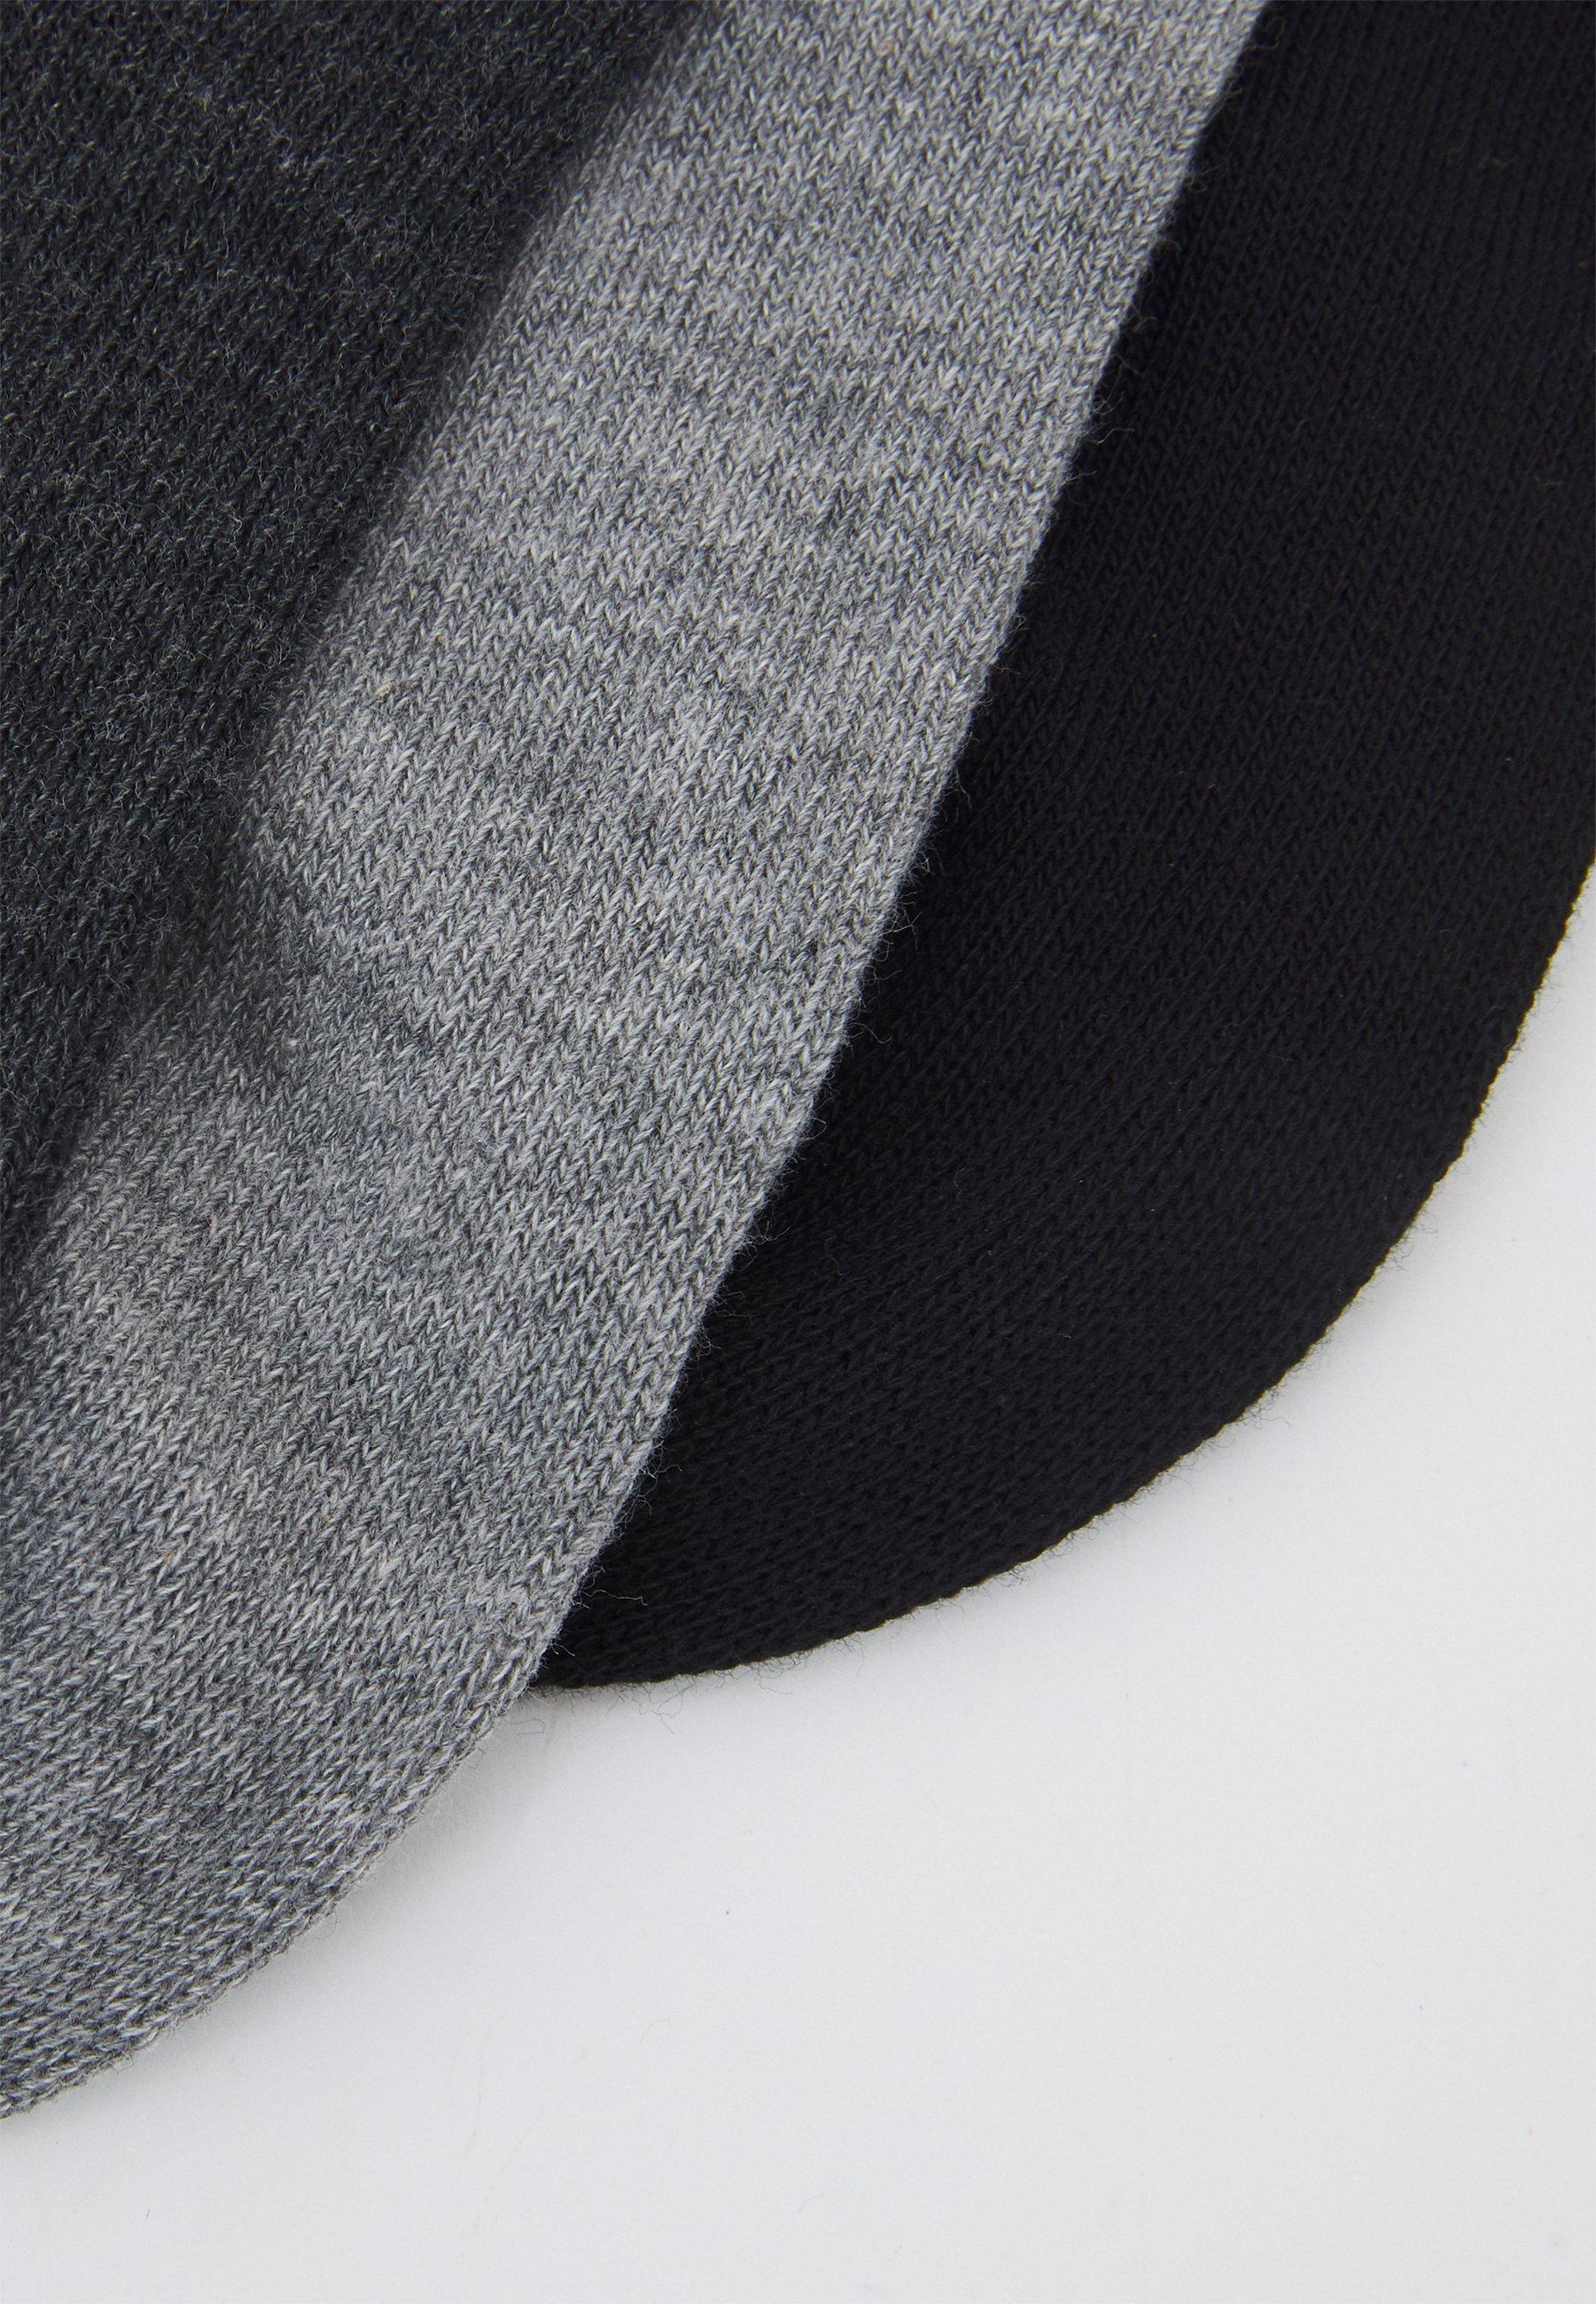 Femme WOMEN LINER LOGO 3 PACK - Chaussettes